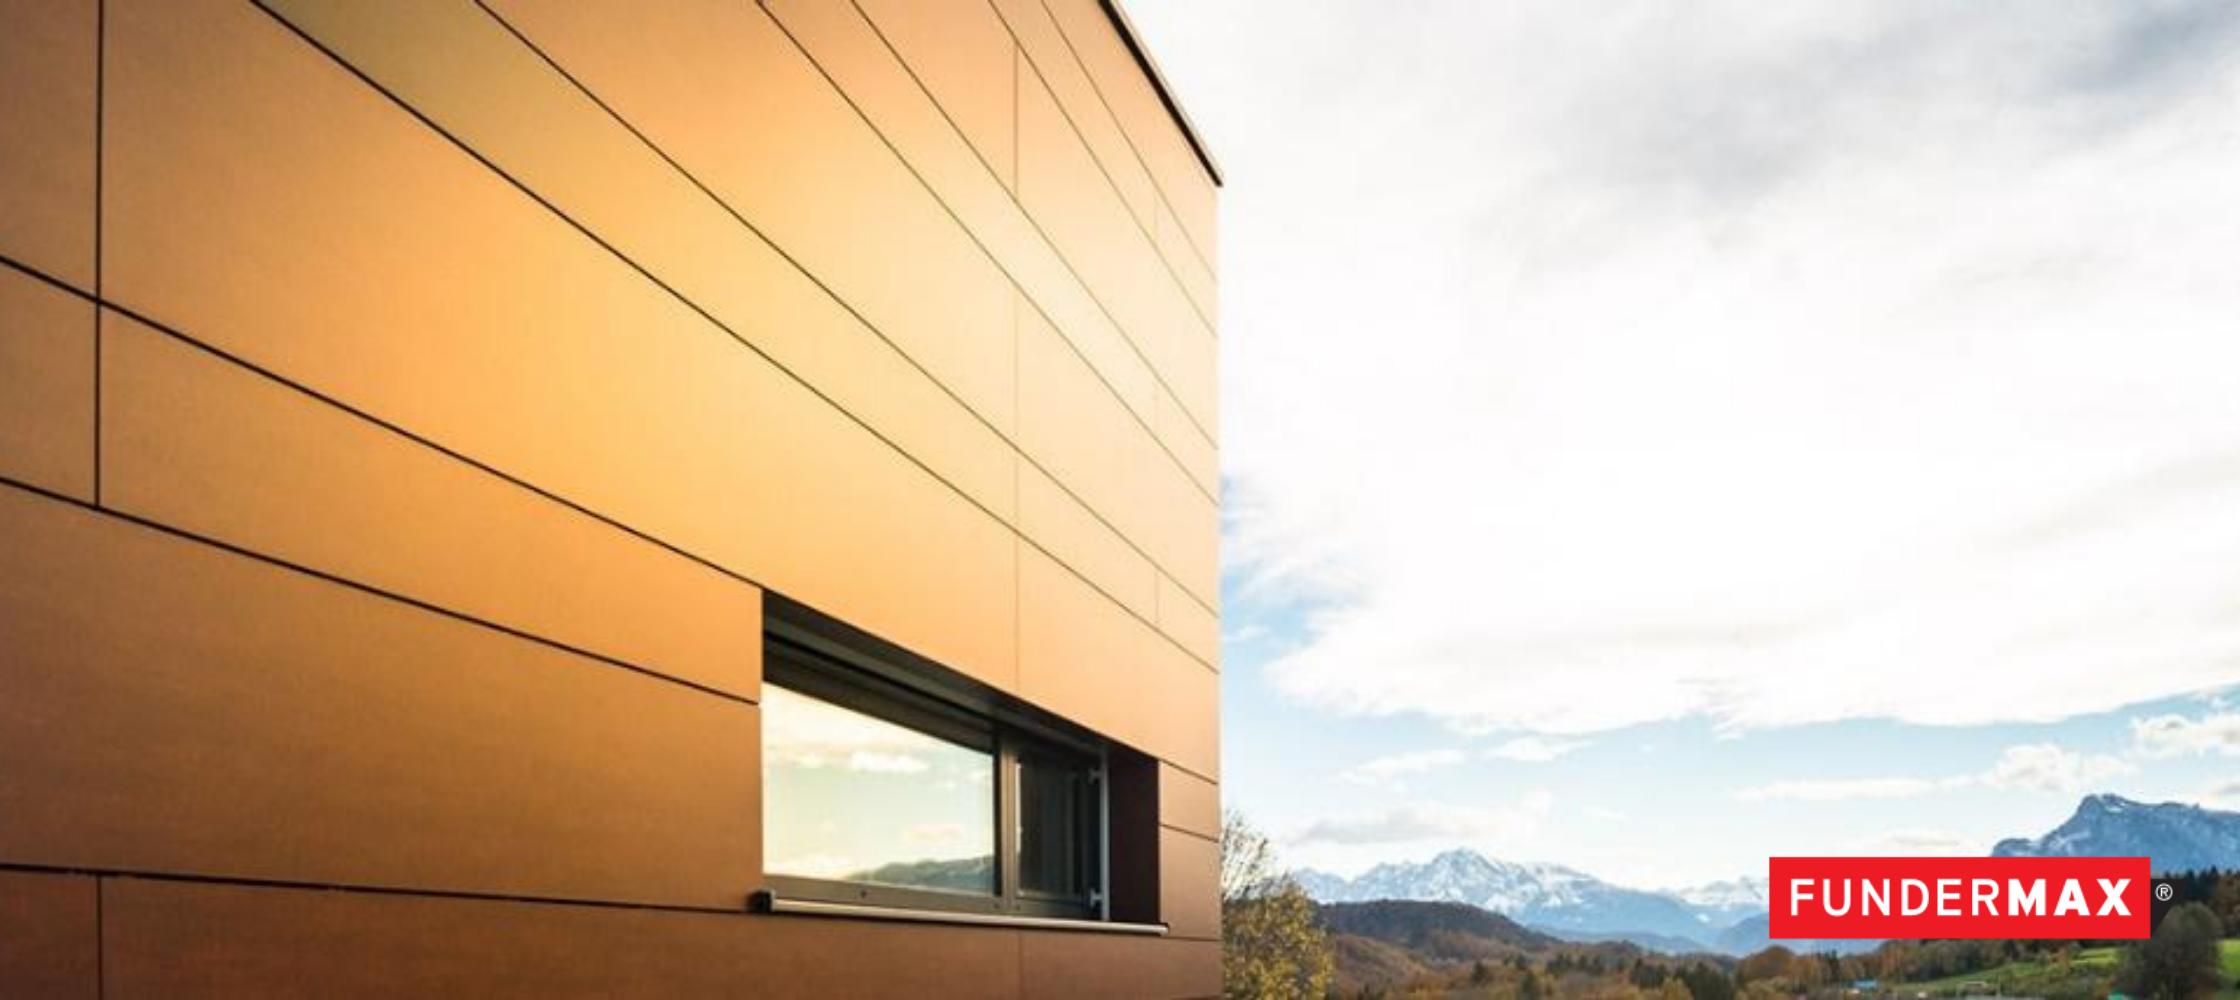 Three Benefits of Using Exterior Phenolic Panels